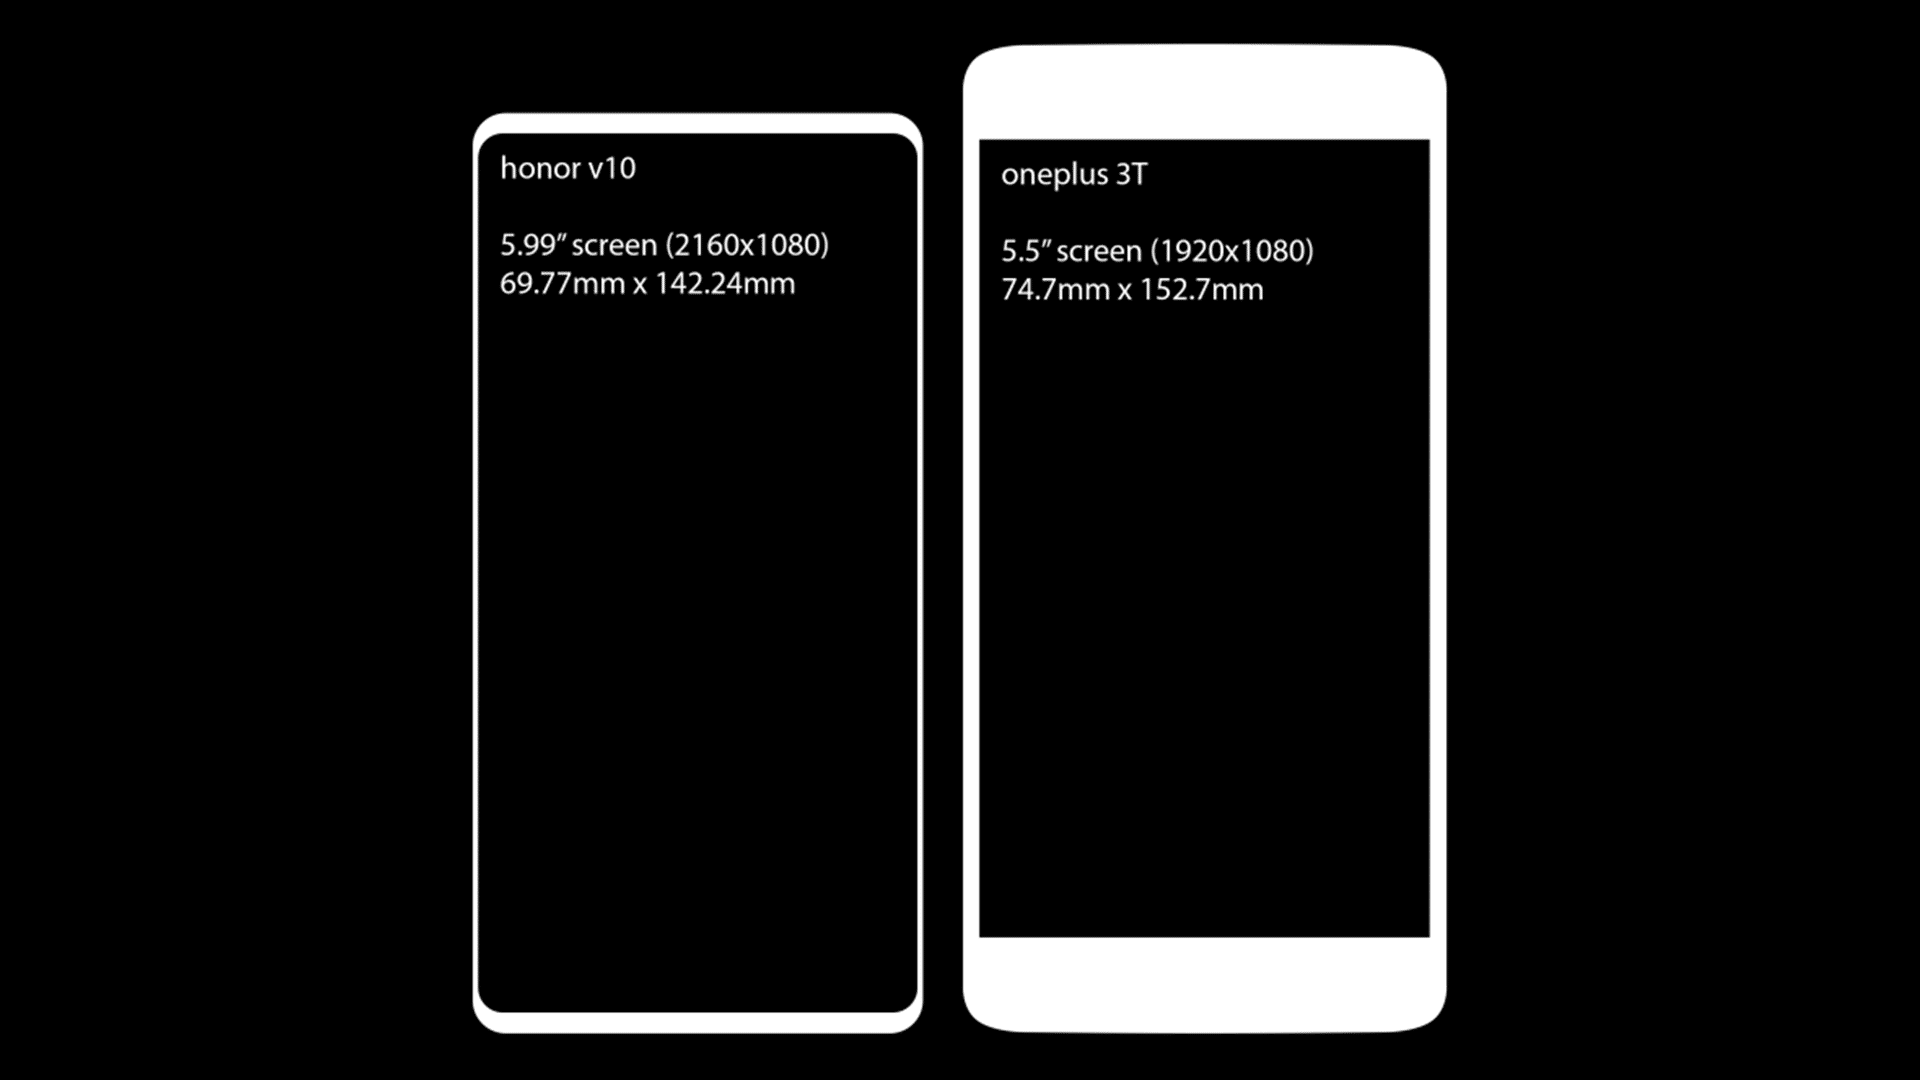 New Honor V10 Leak Suggests A 5.99 Inch 1080 18:9 Display !